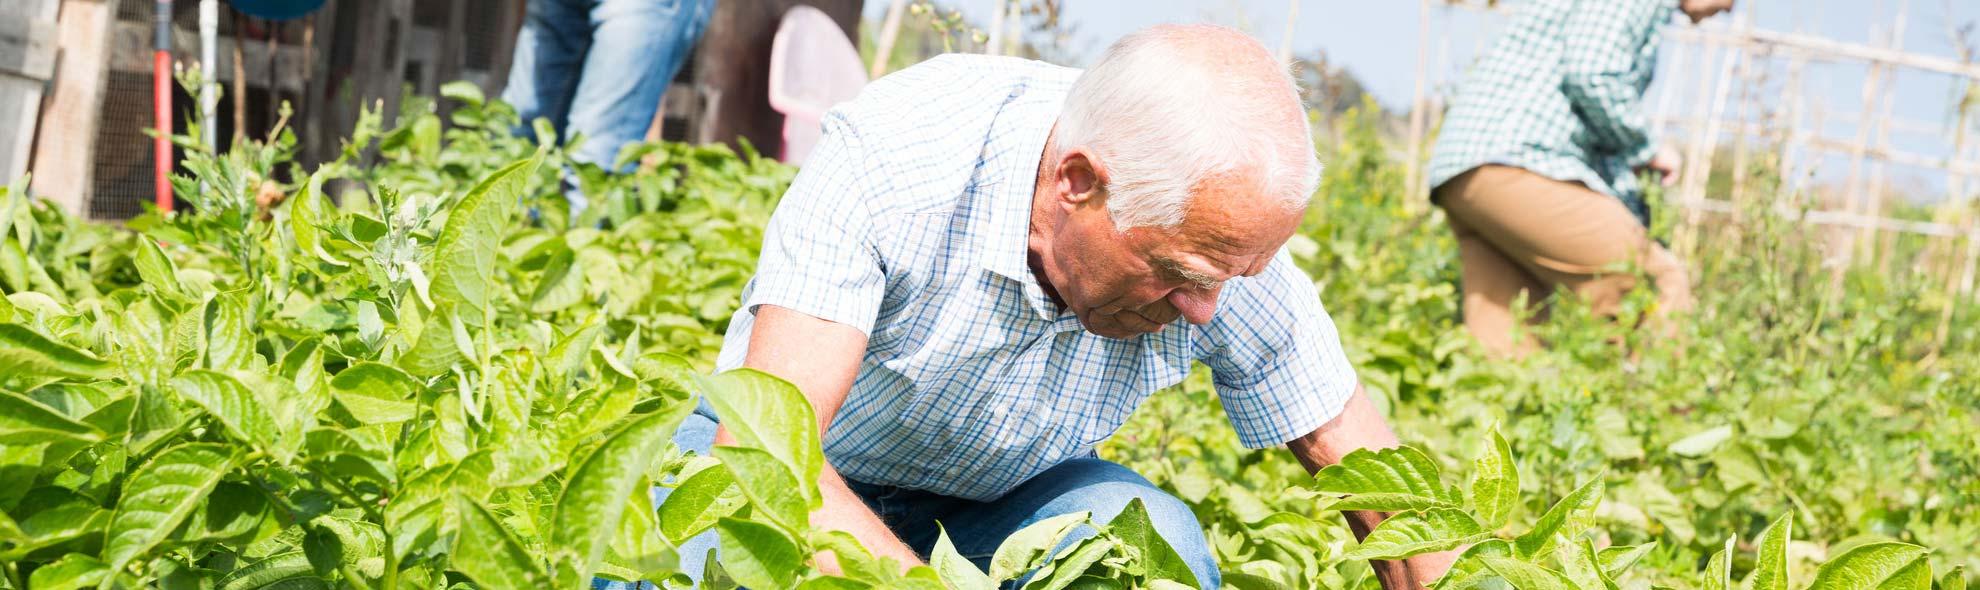 LoveInCare dagbesteding voor senioren met lichte dementie